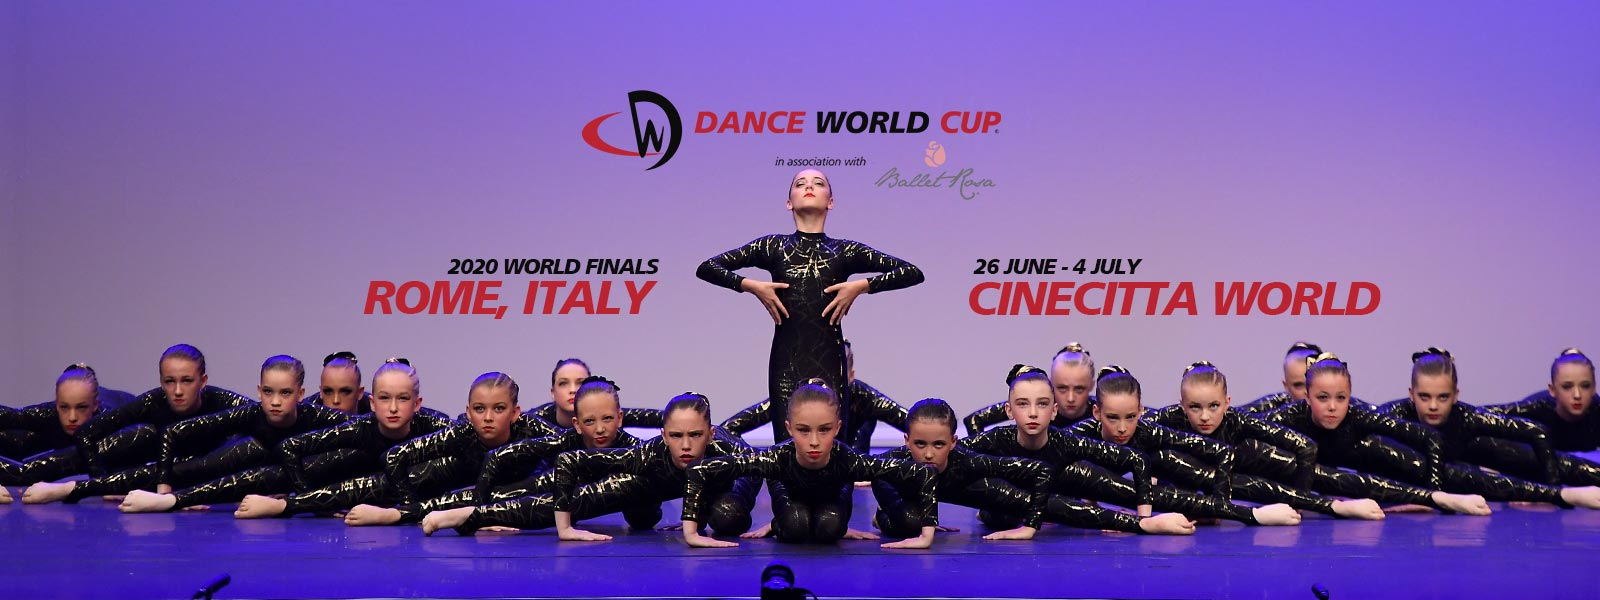 Dance World Cup